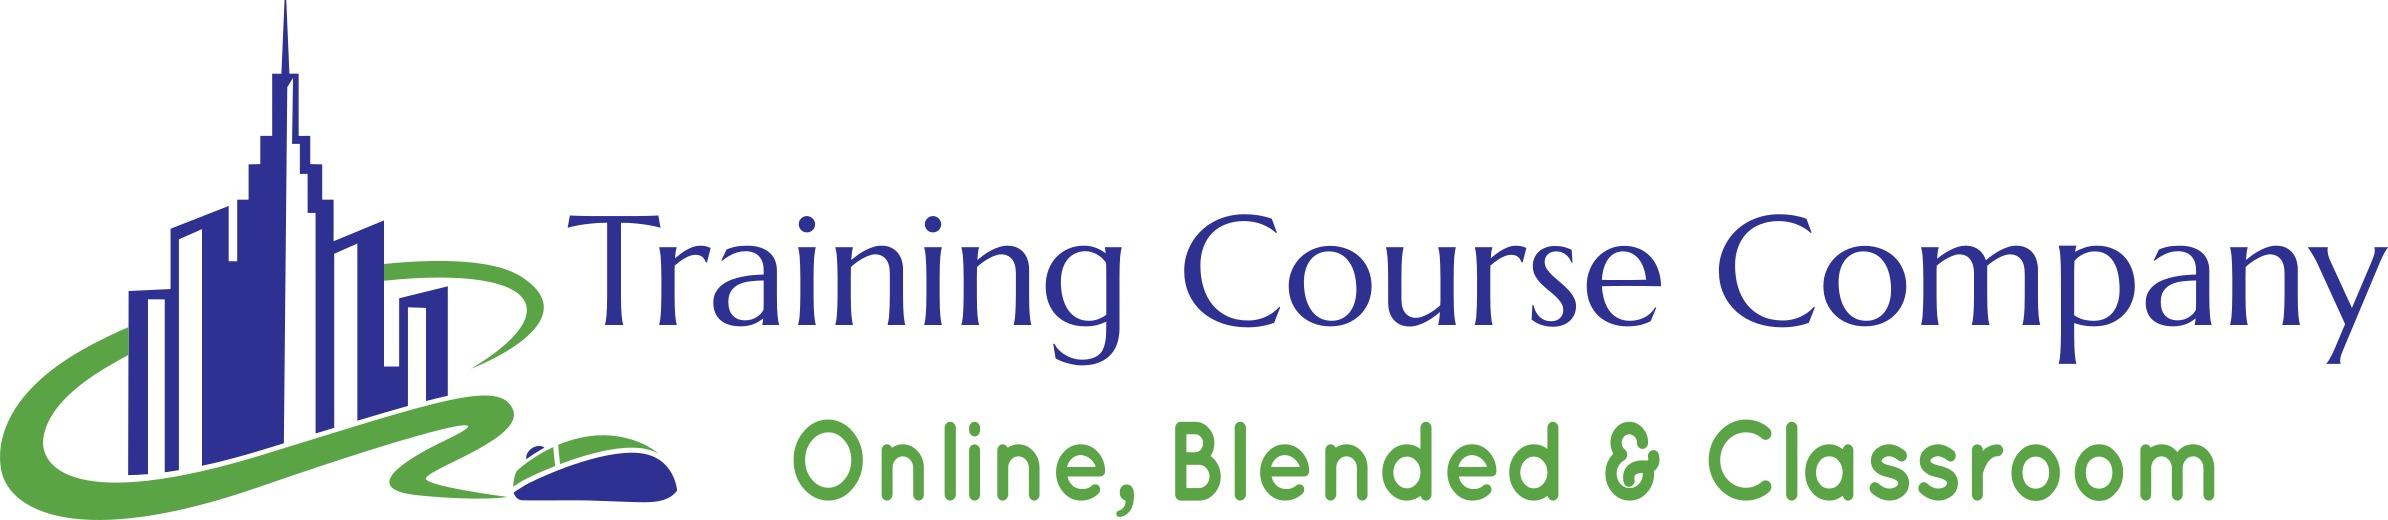 Training Course Company